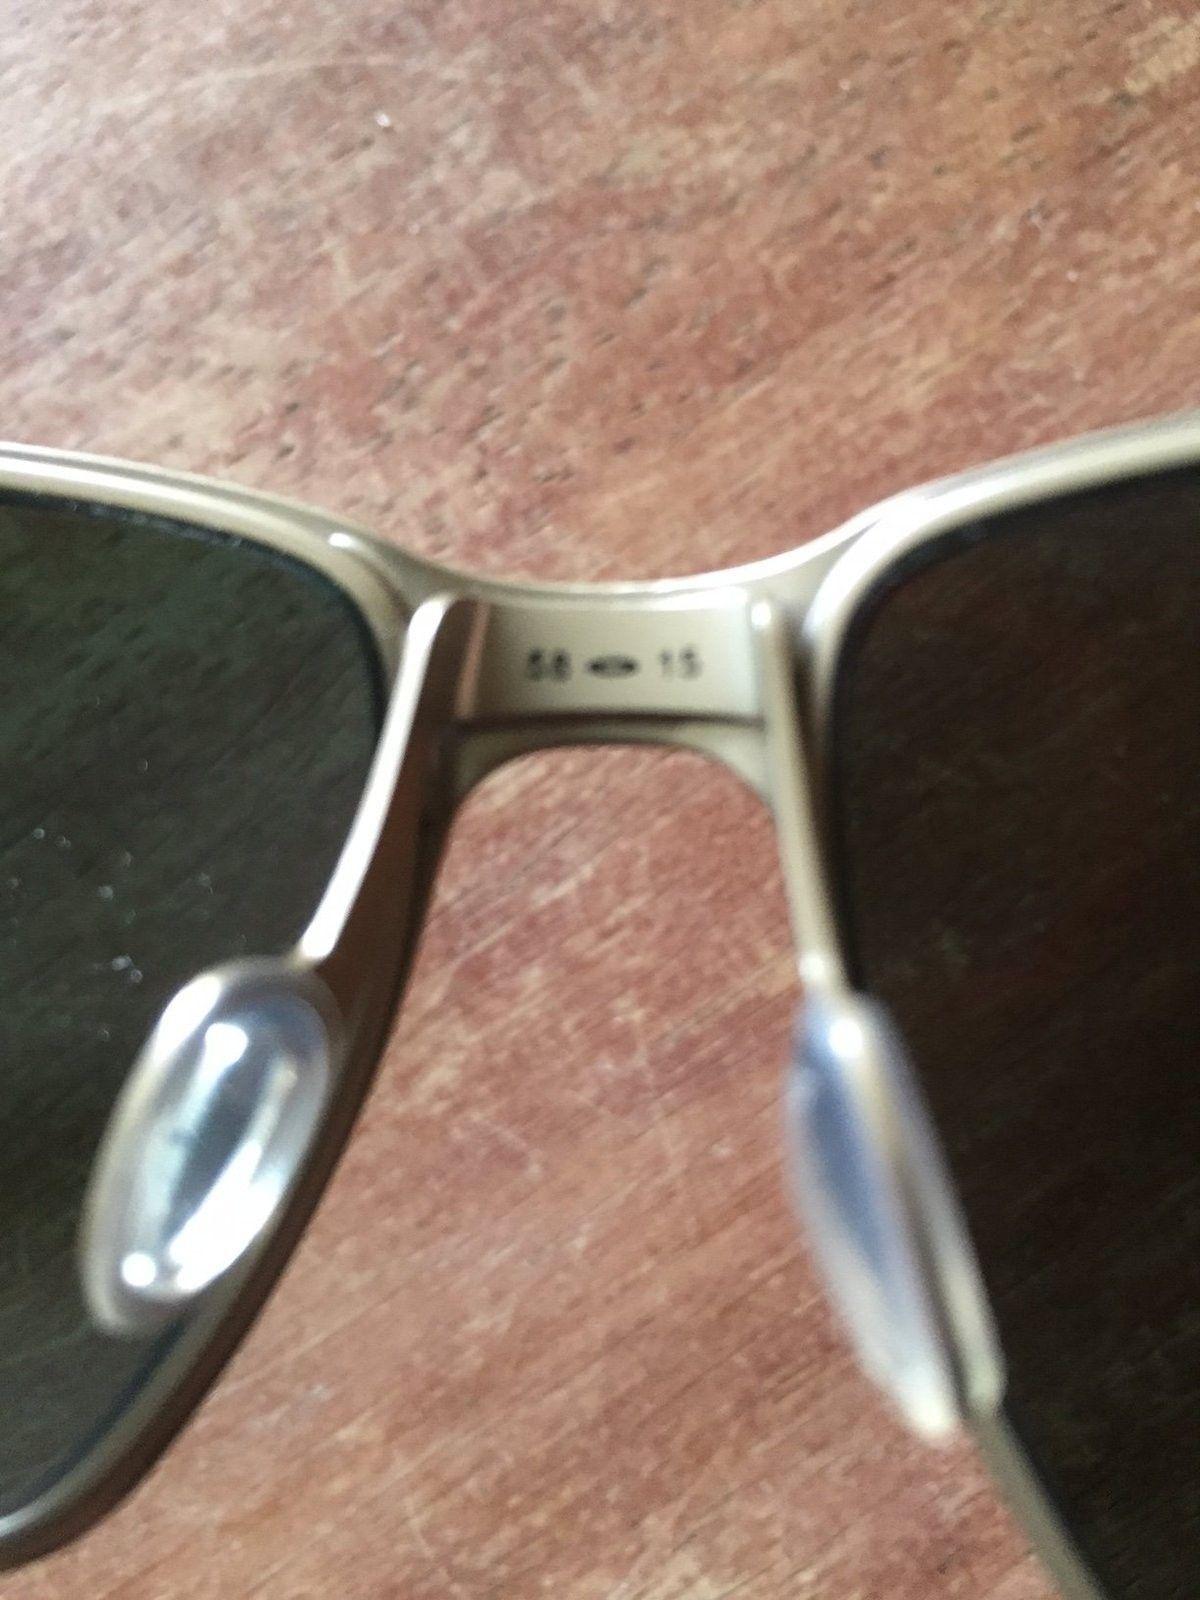 Real or fake? Oakley Tincan - Pic1.JPG